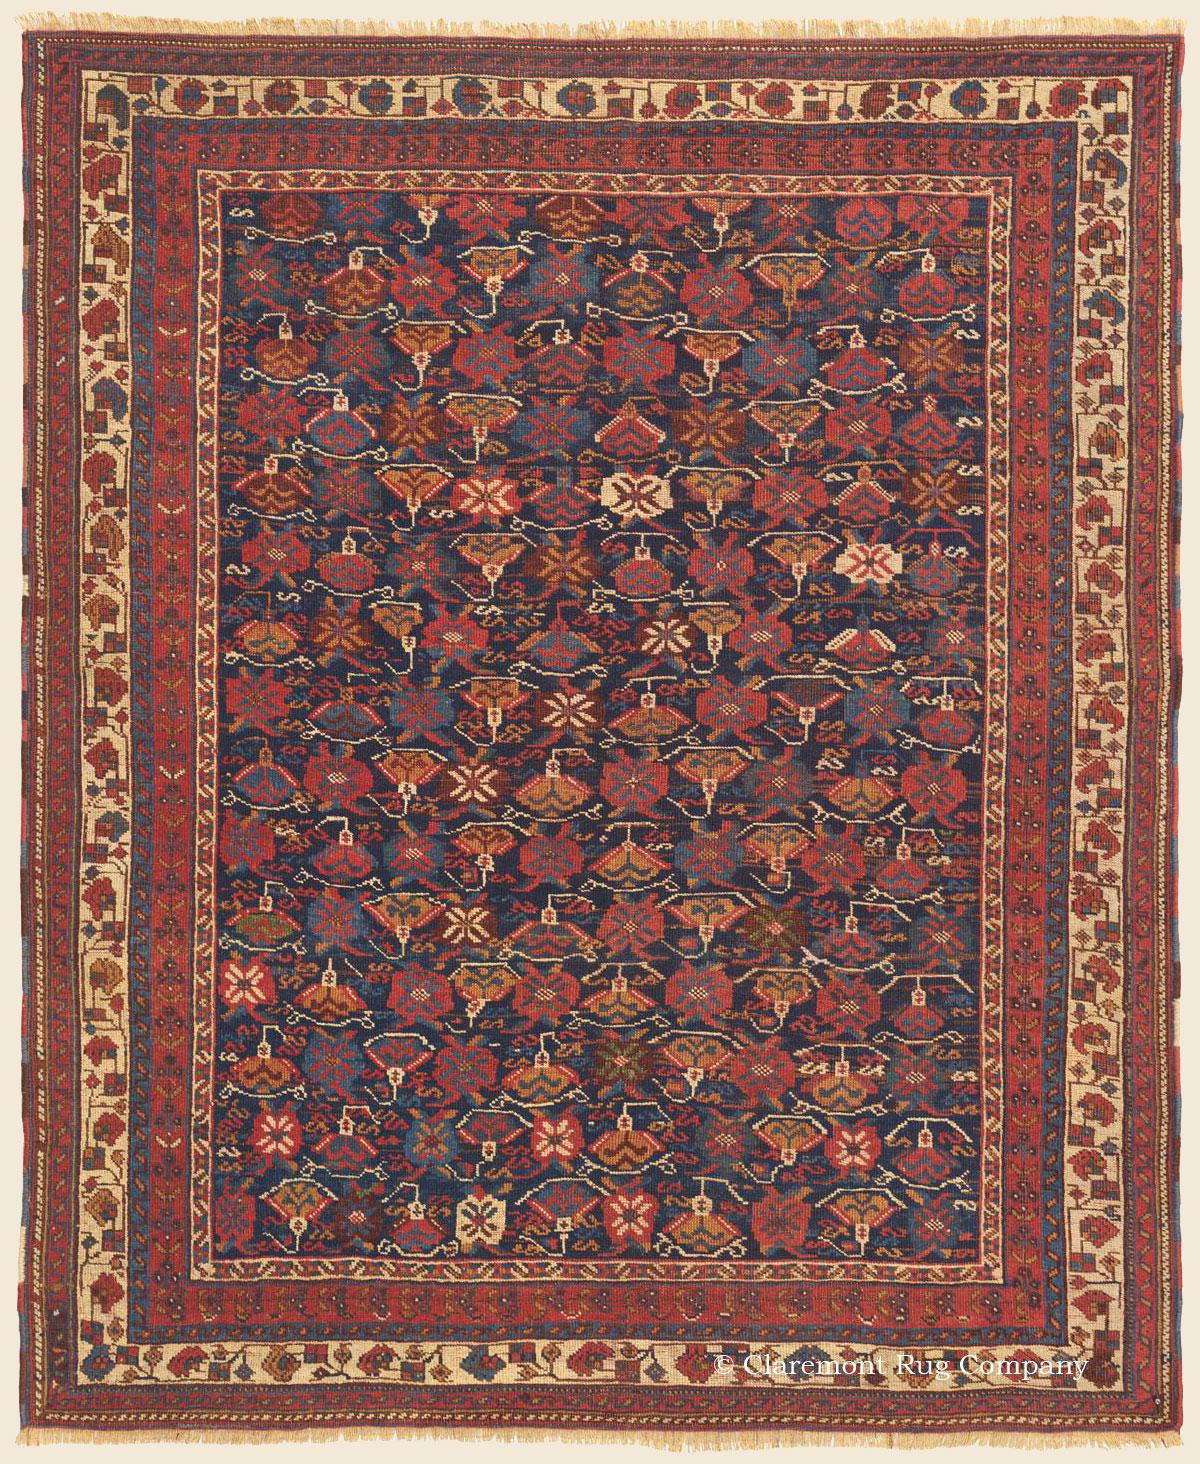 AFSHAR, Southeast Persian Antique Rug